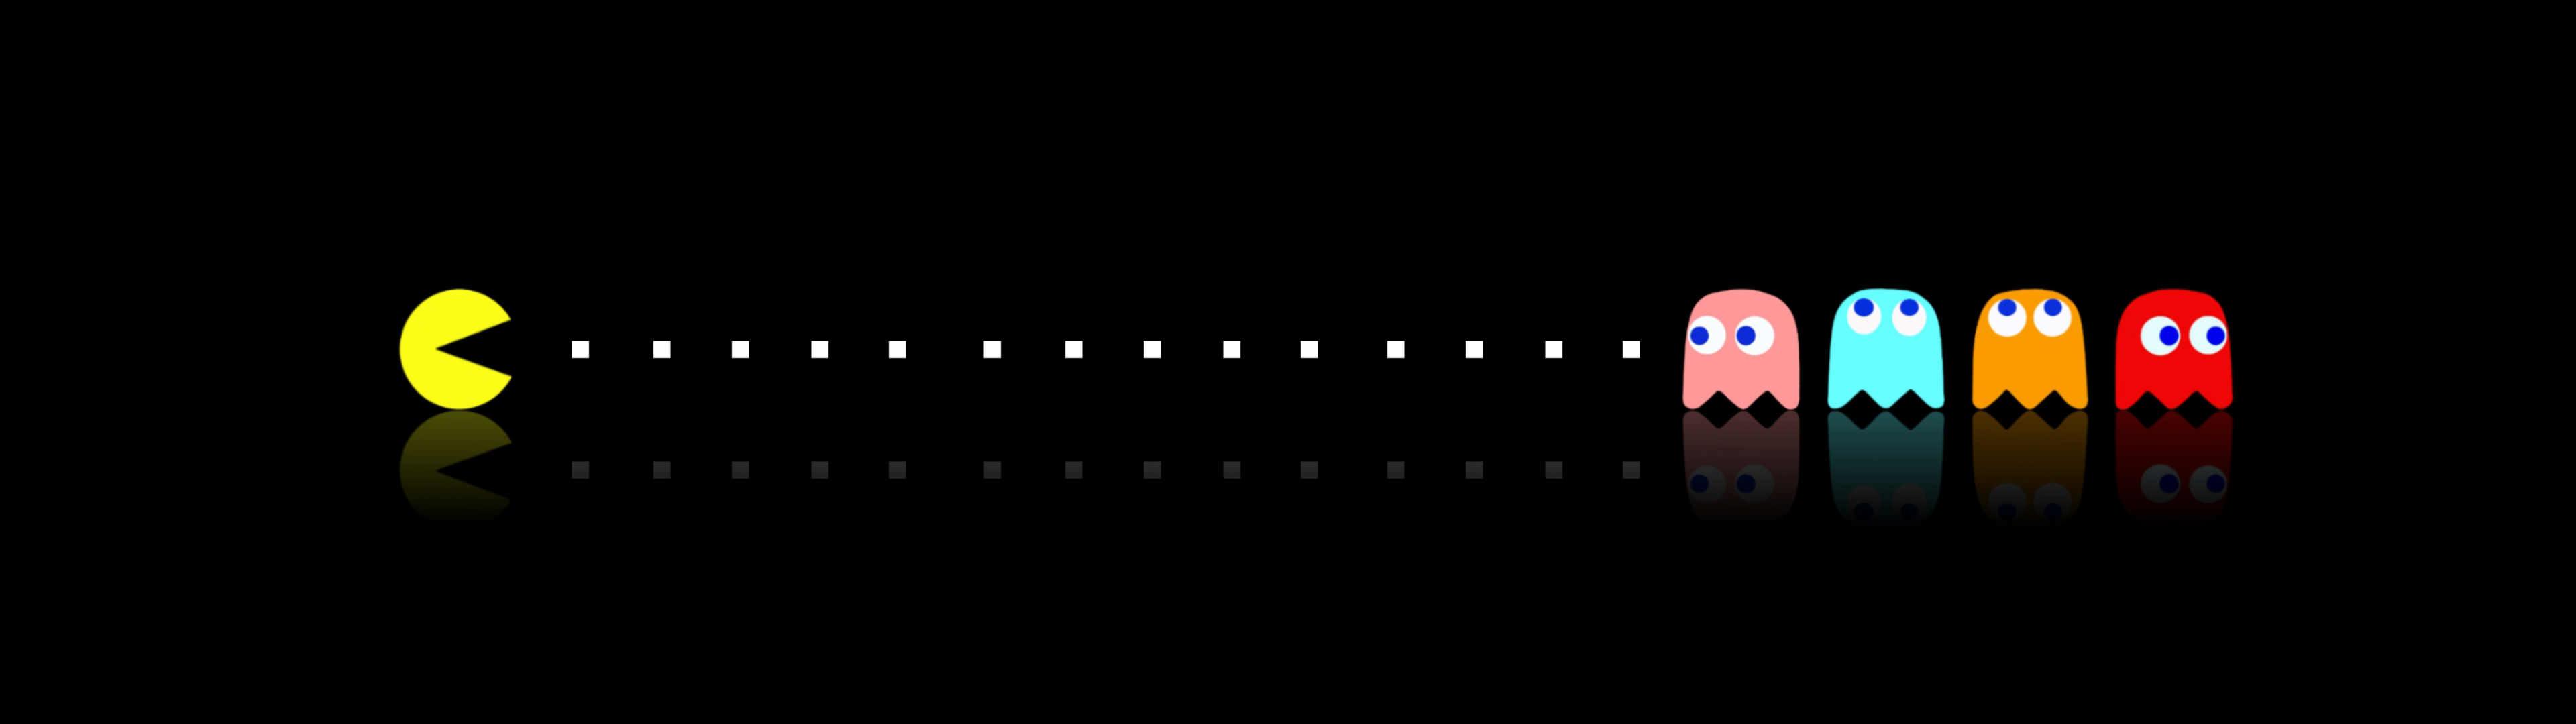 Kelli Chalker, Dual Monitor 3840×1080, 3840×1080